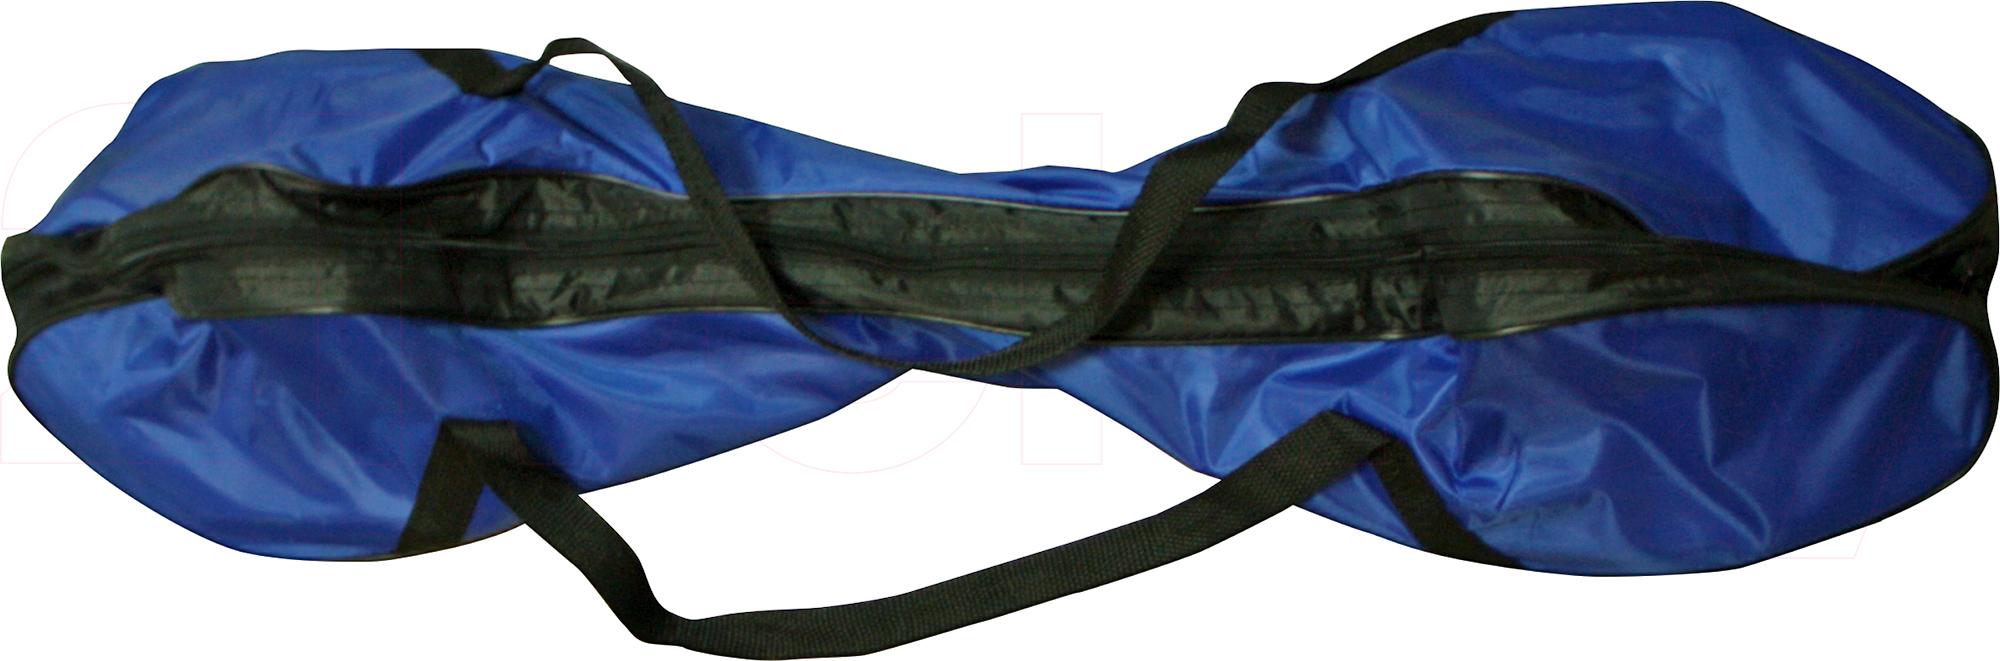 GF-HL4 (Blue) 21vek.by 322000.000